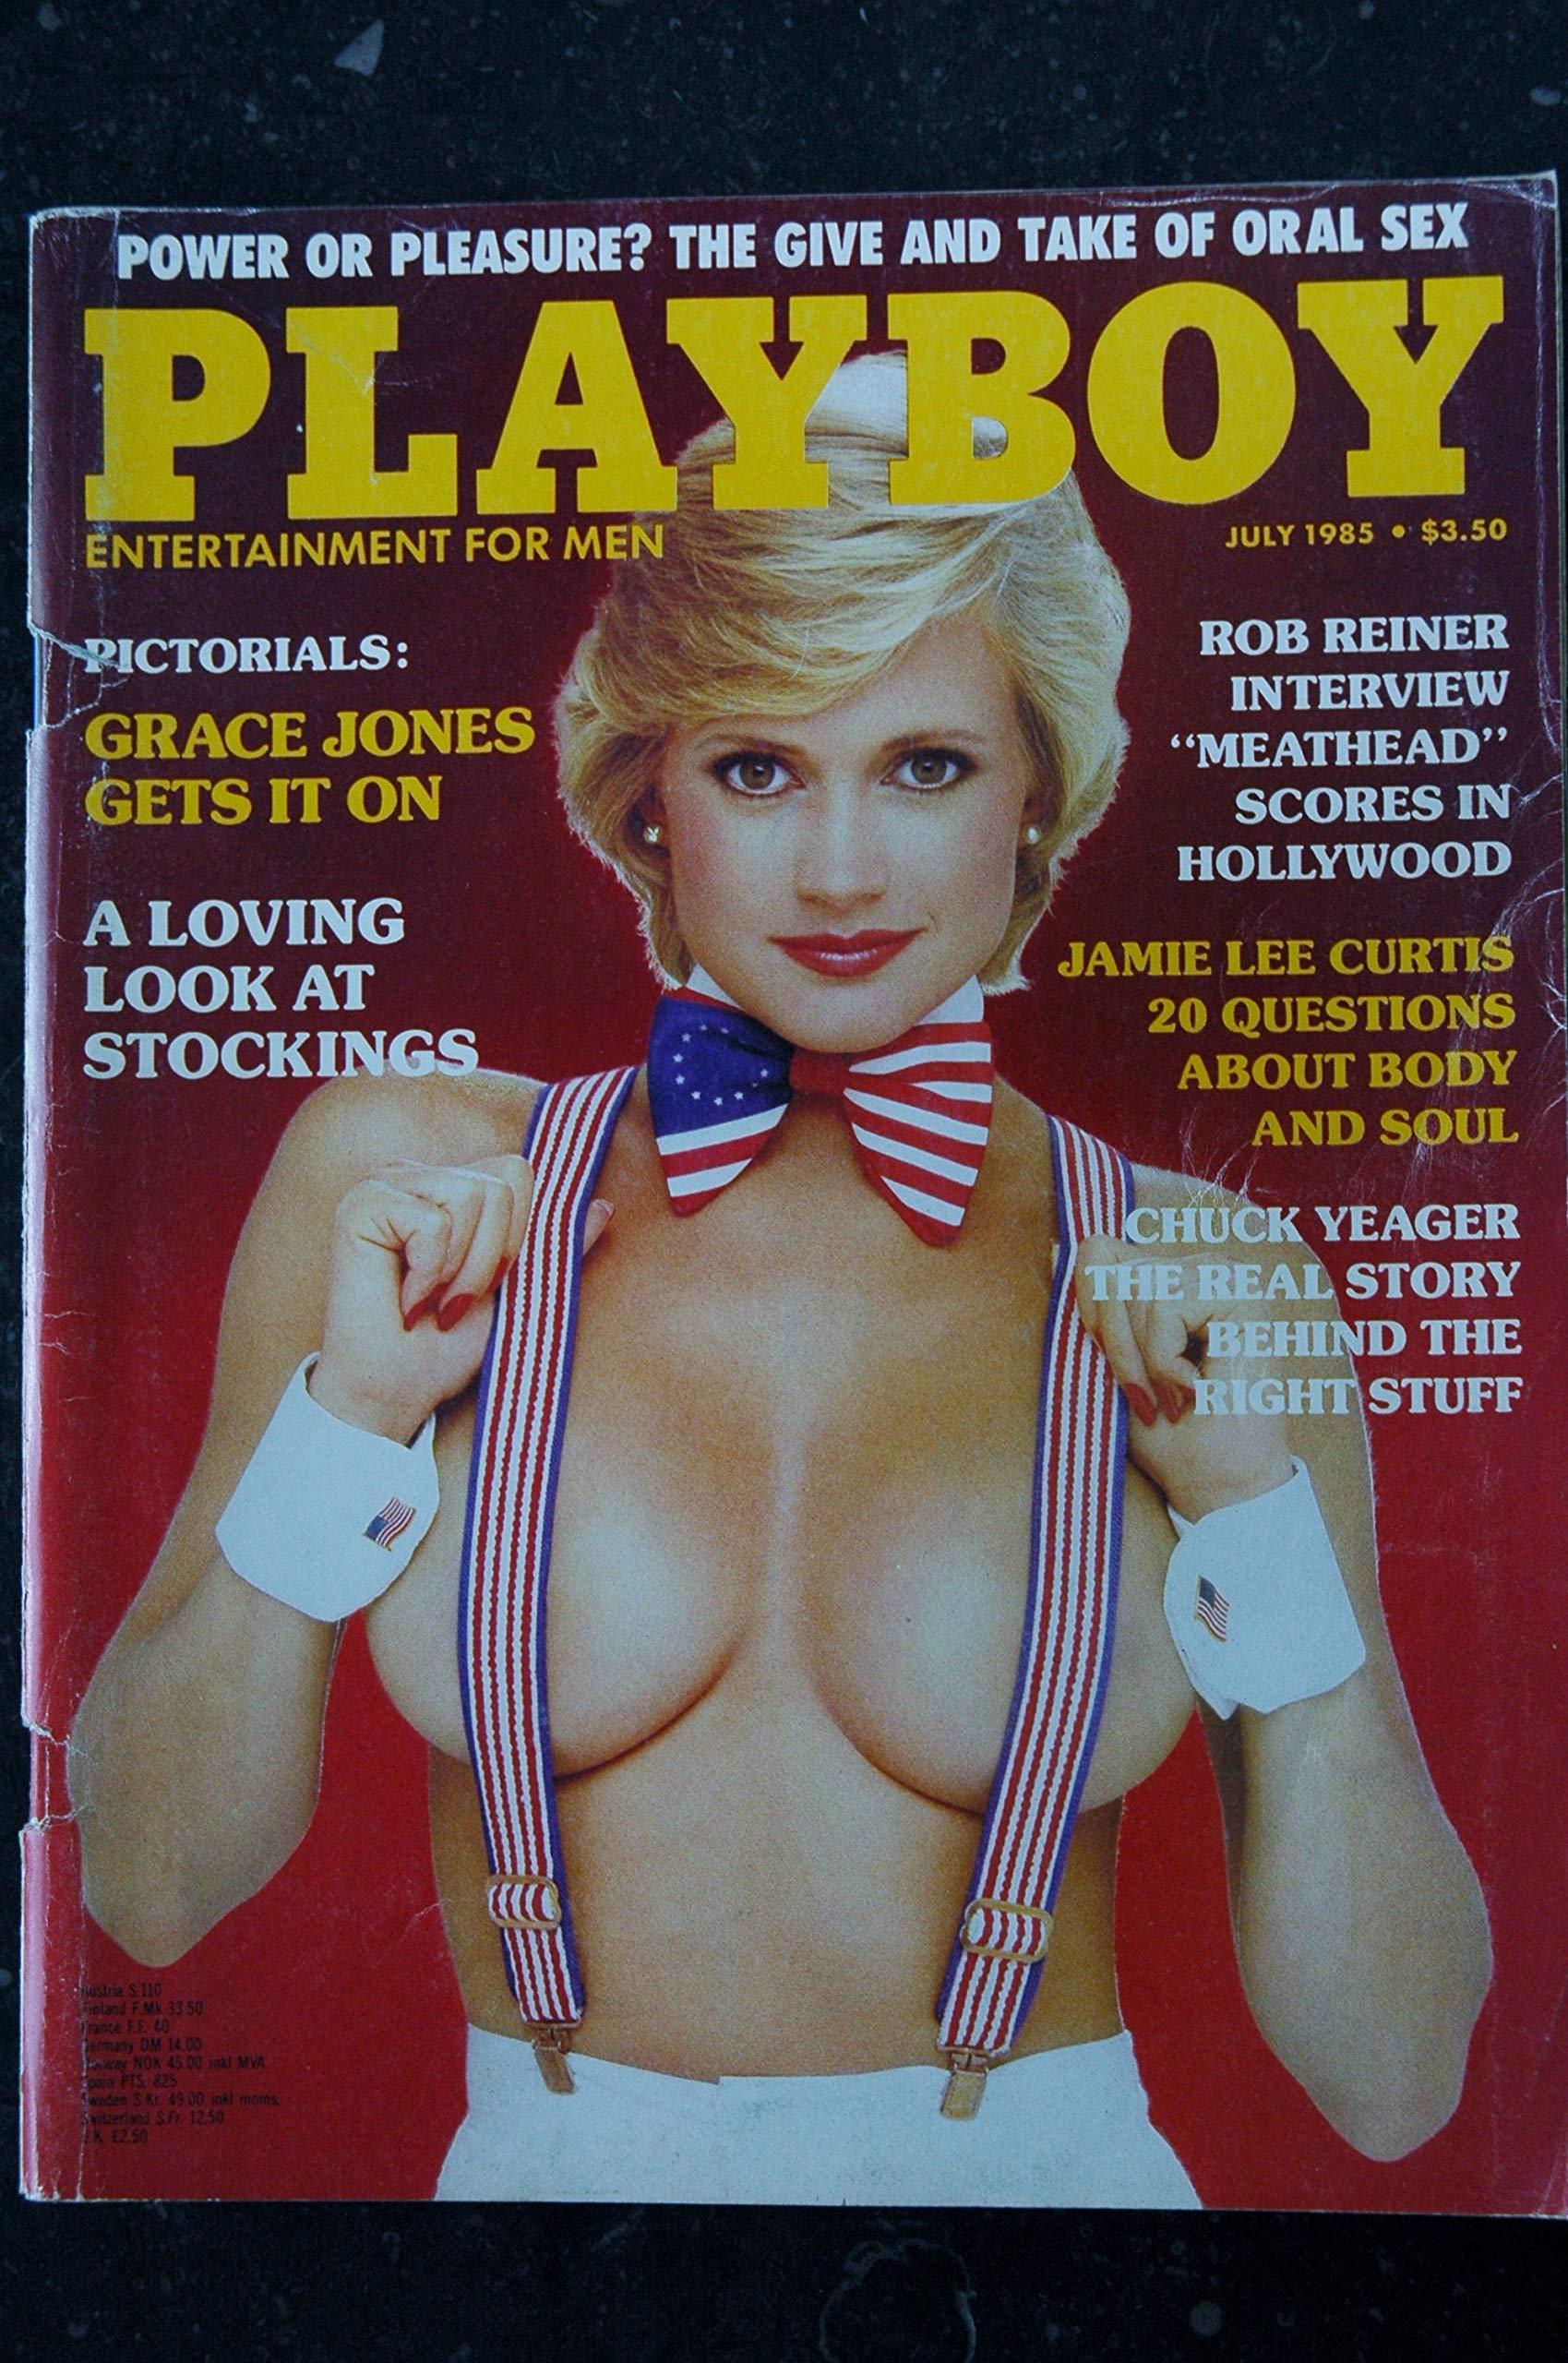 Playboy grace jones Grace Jones